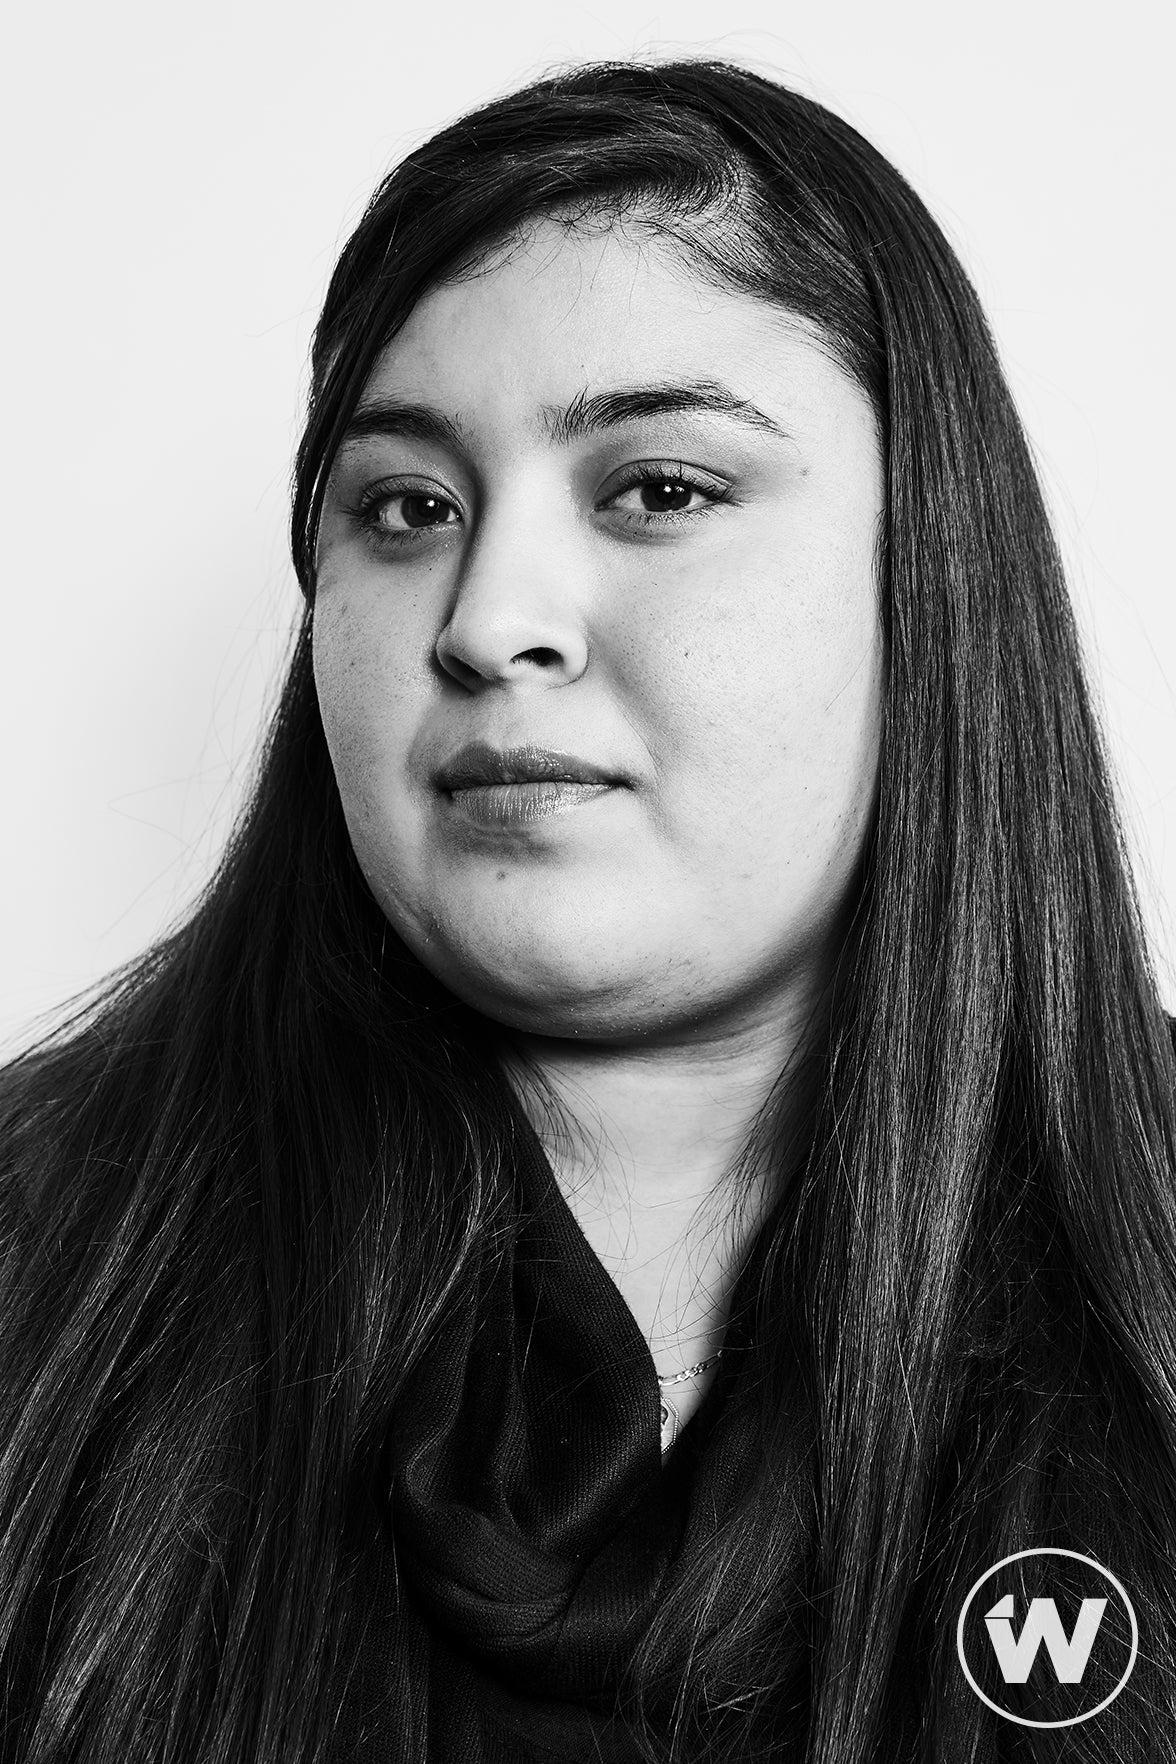 Monica Betancourt, La Leyenda Negra